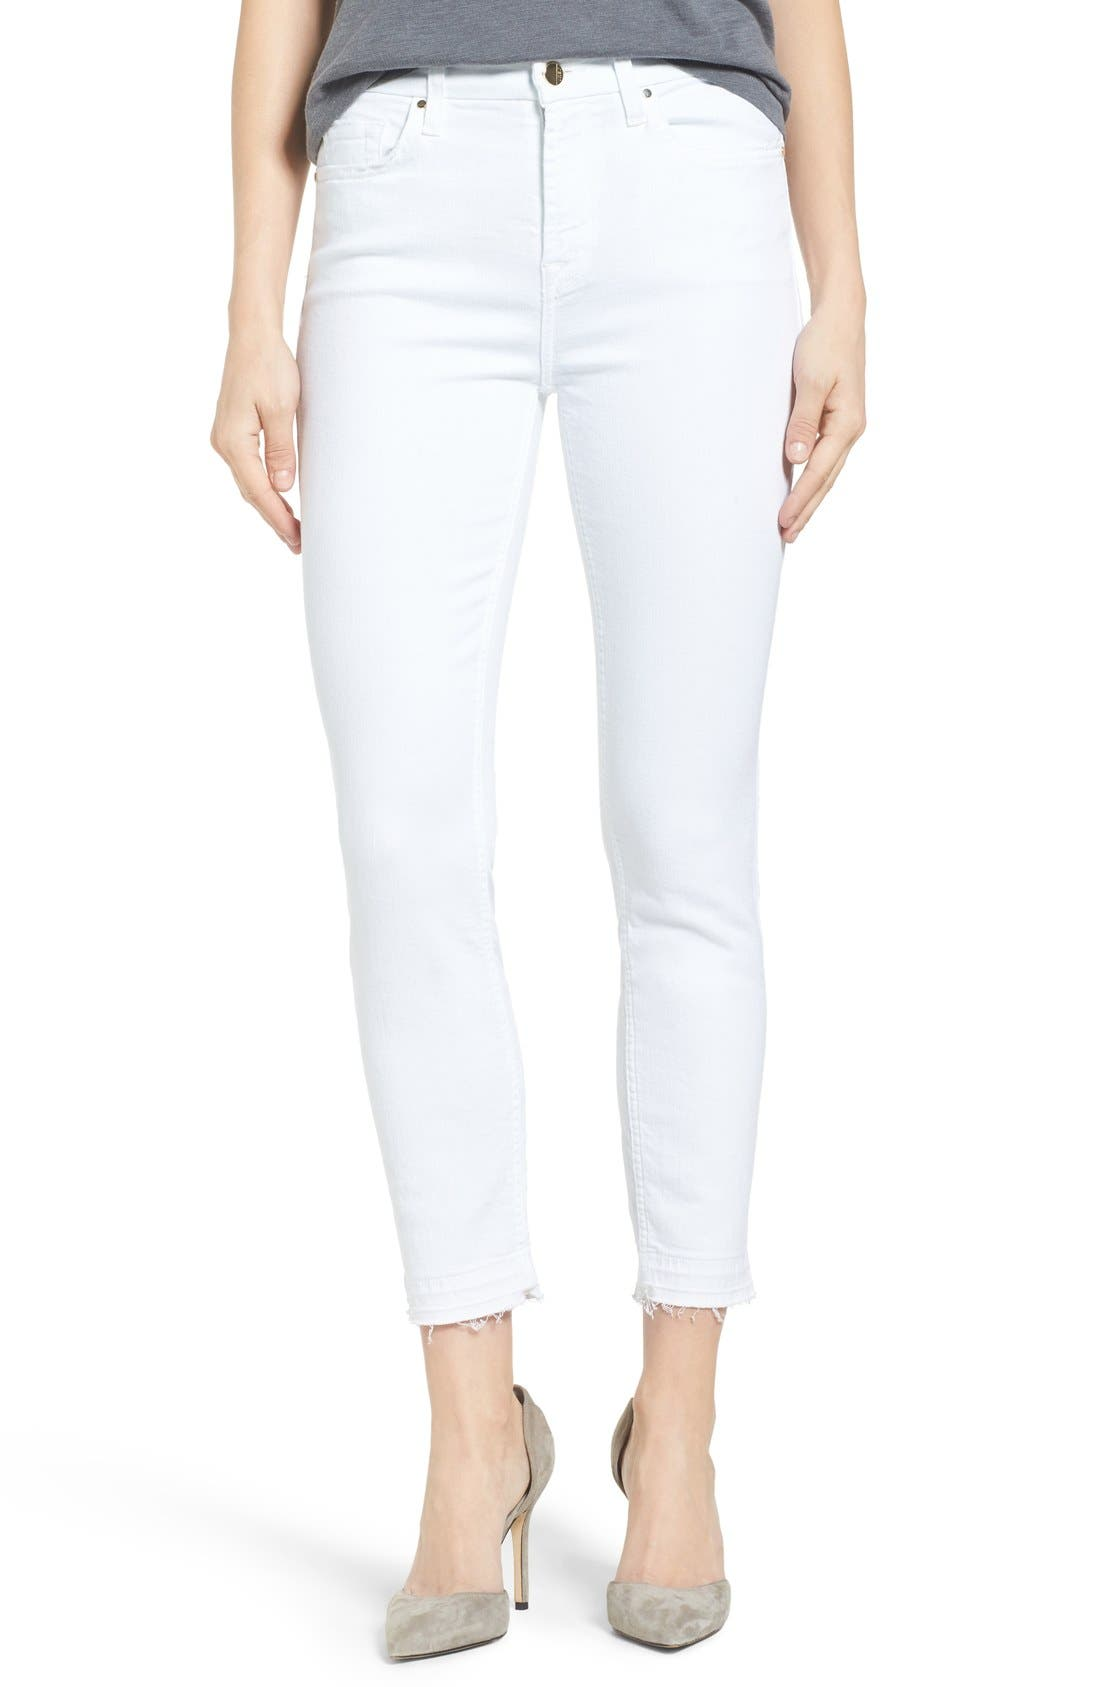 Jen7 Release Hem Stretch Skinny Ankle Jeans